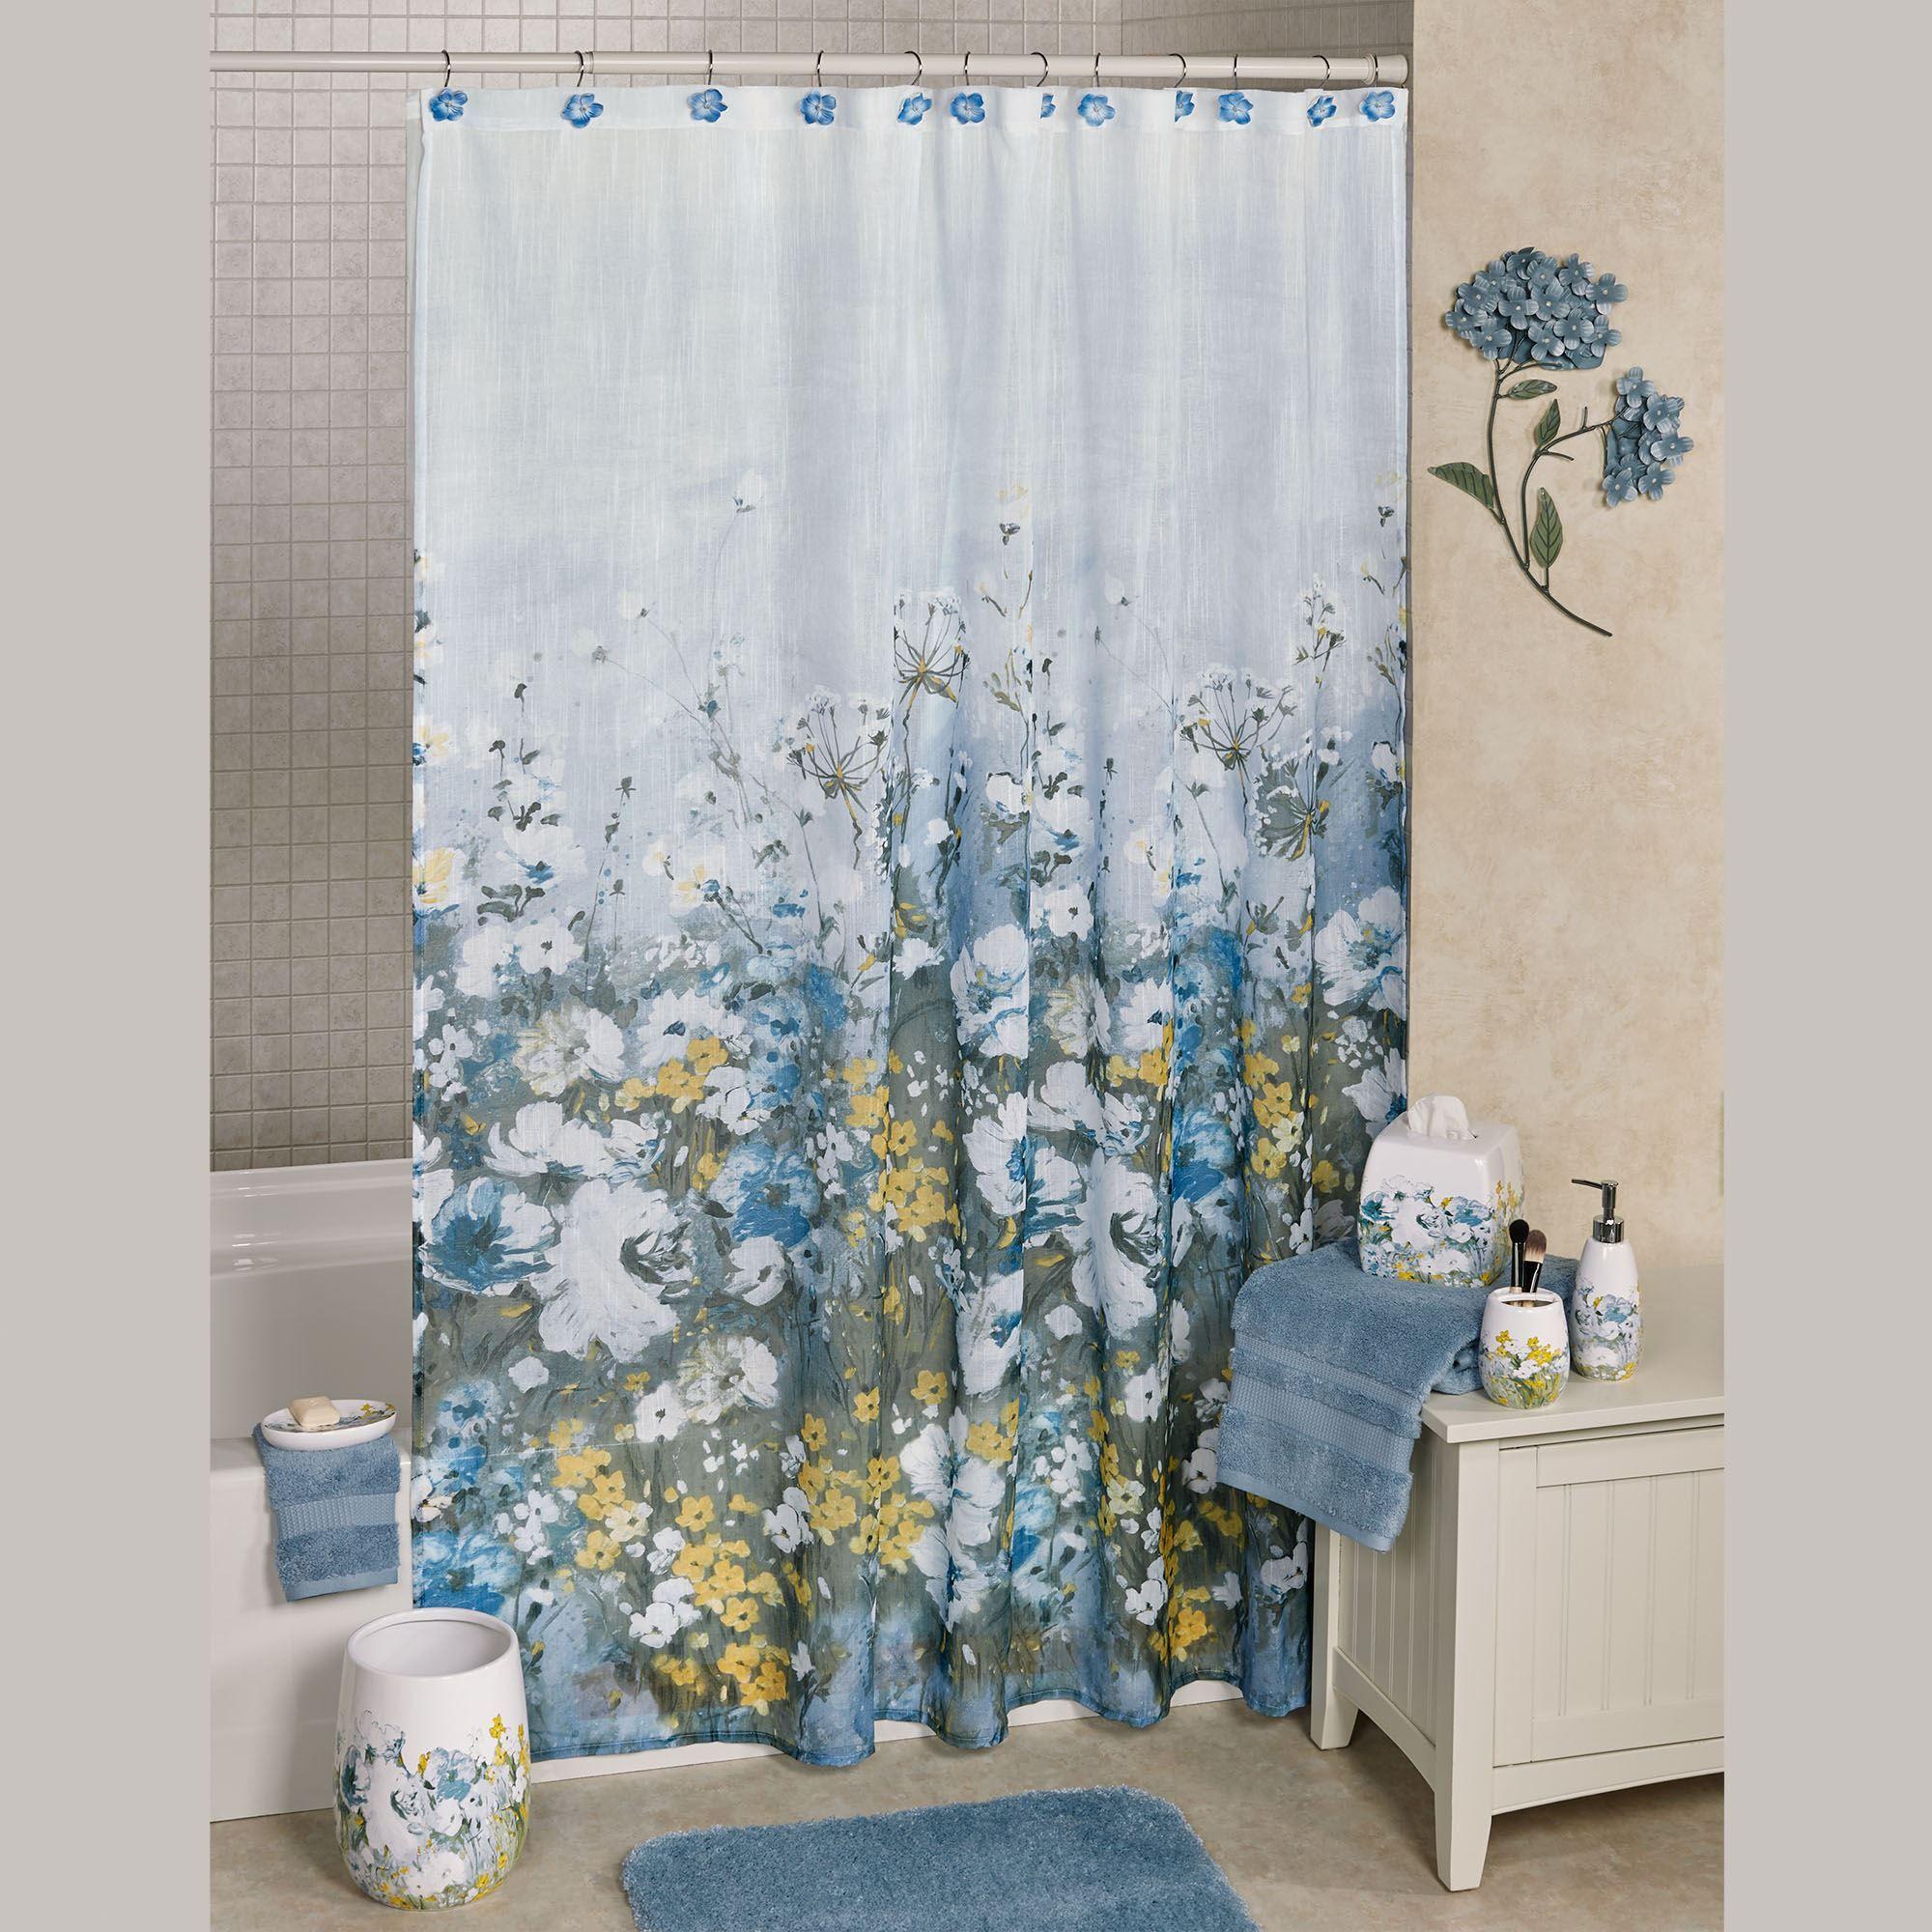 Anna Blue Semi Sheer Shower Curtain Multi Bright 70 X 72